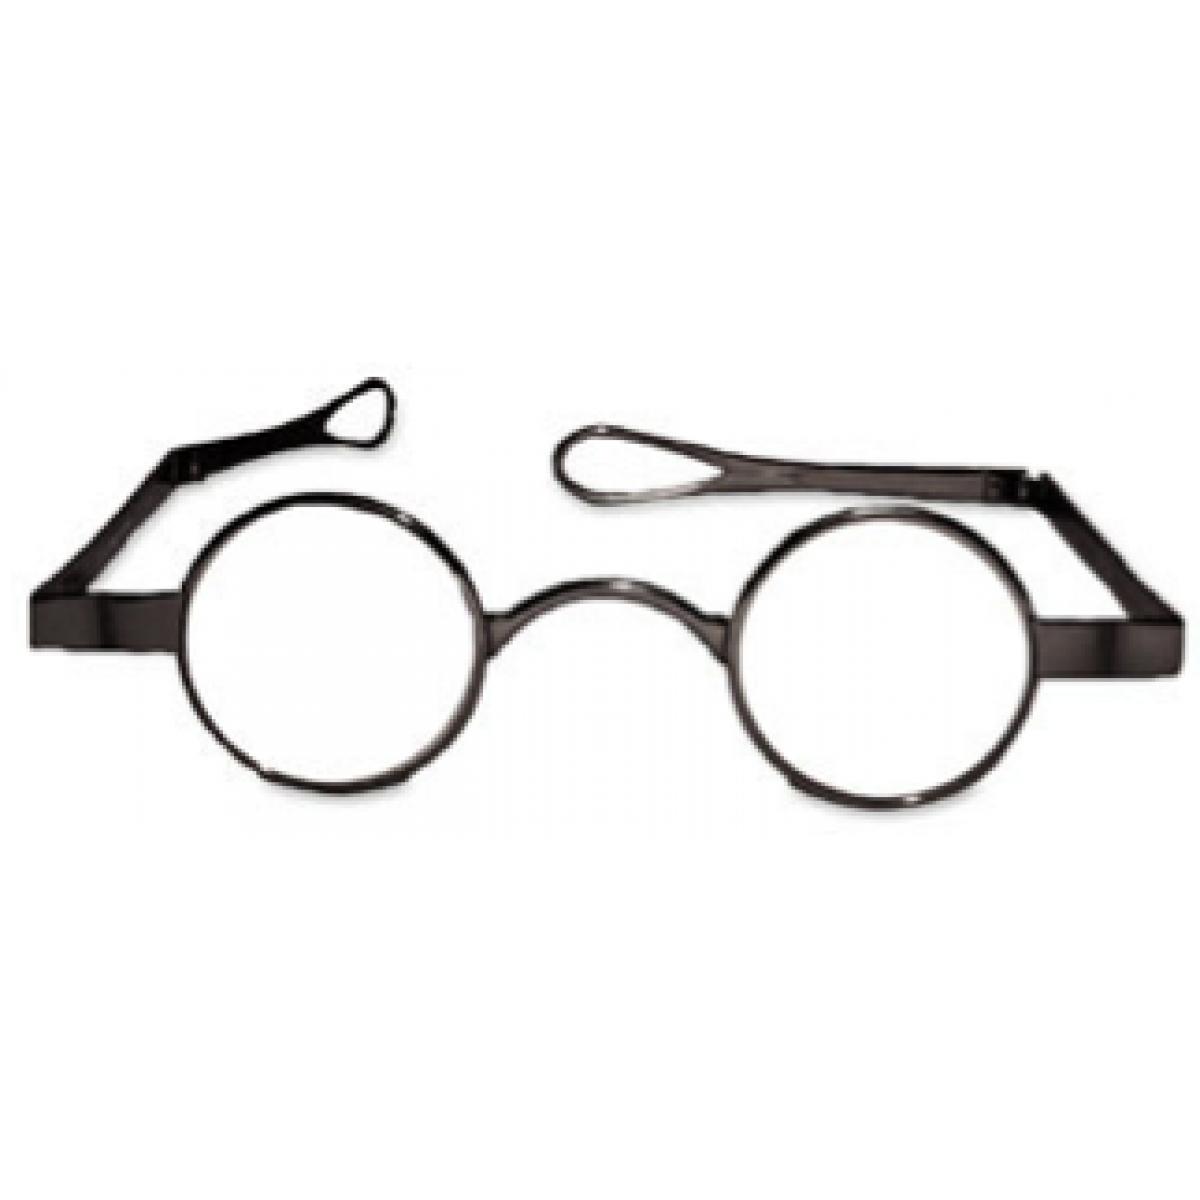 Eyeglass frames without nose pads | Books and Bifocals | Pinterest